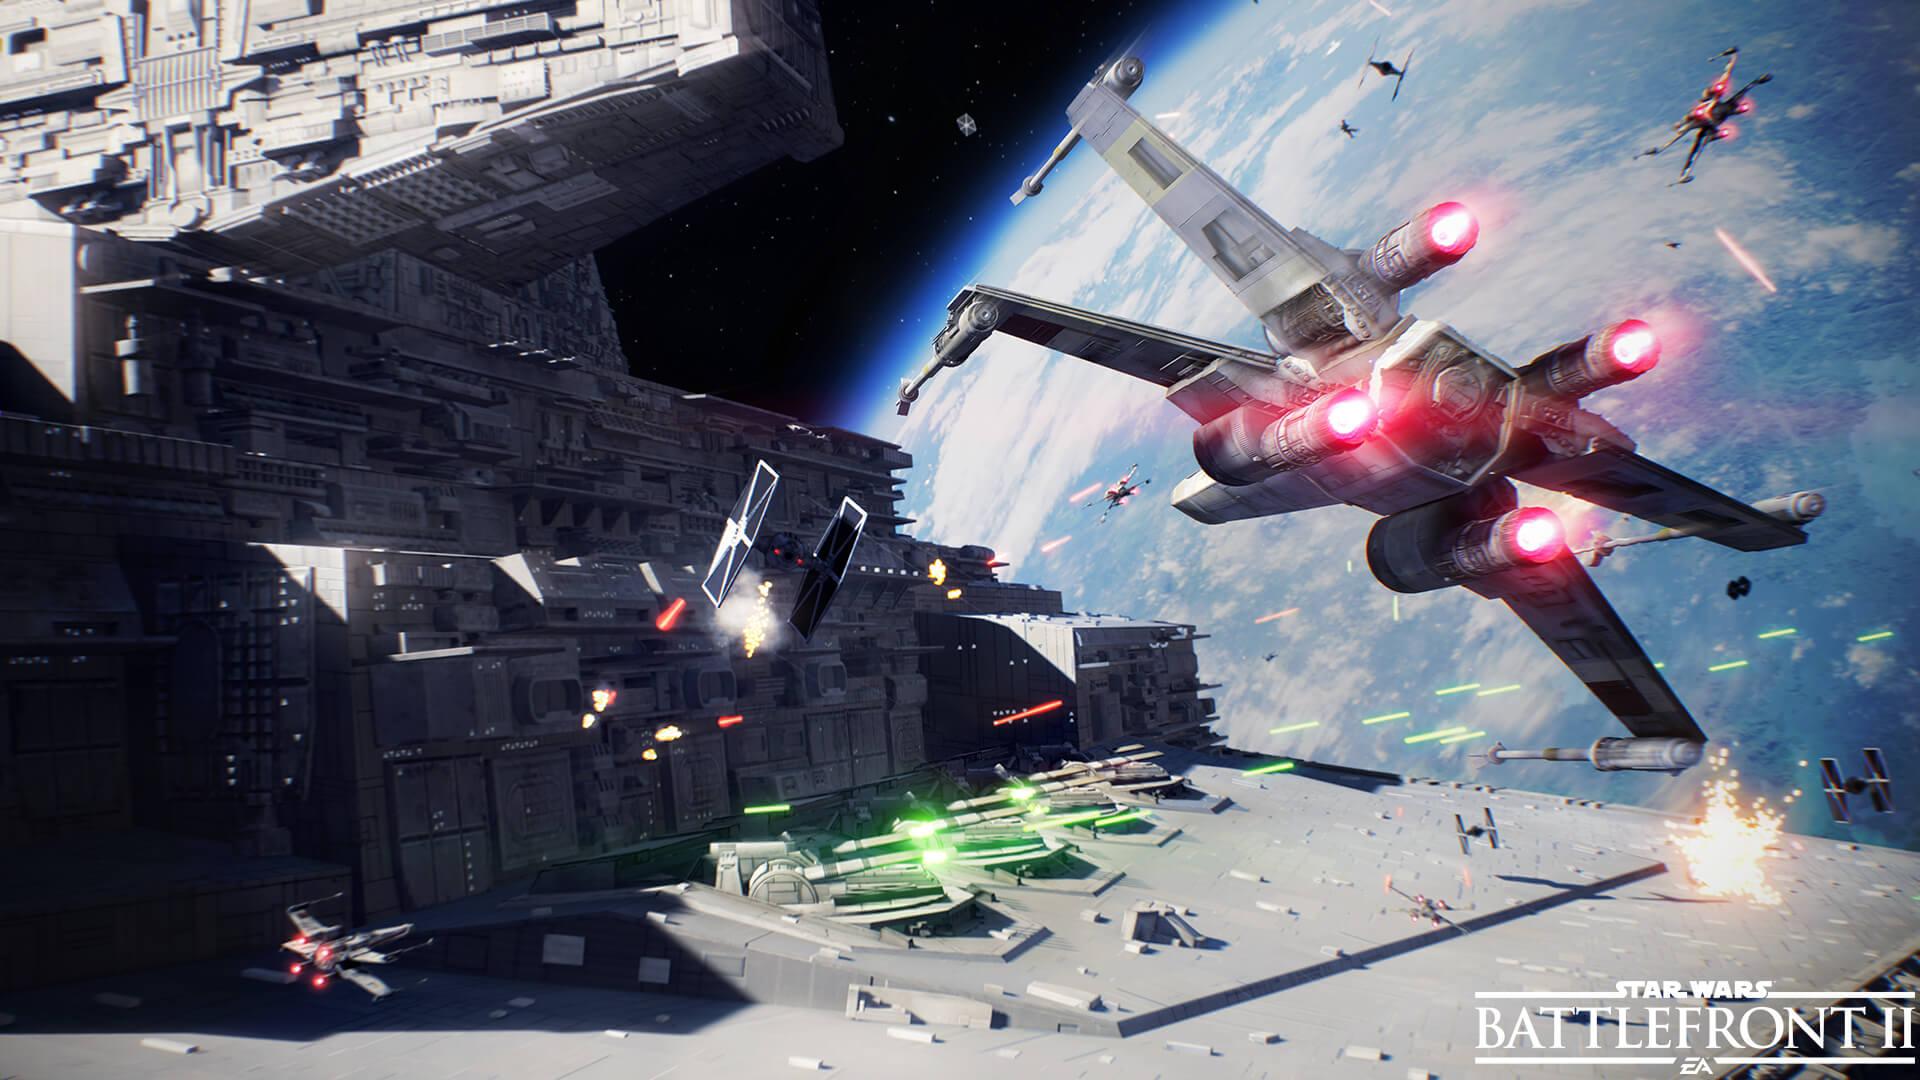 star wars battlefront 8th anniversary edition